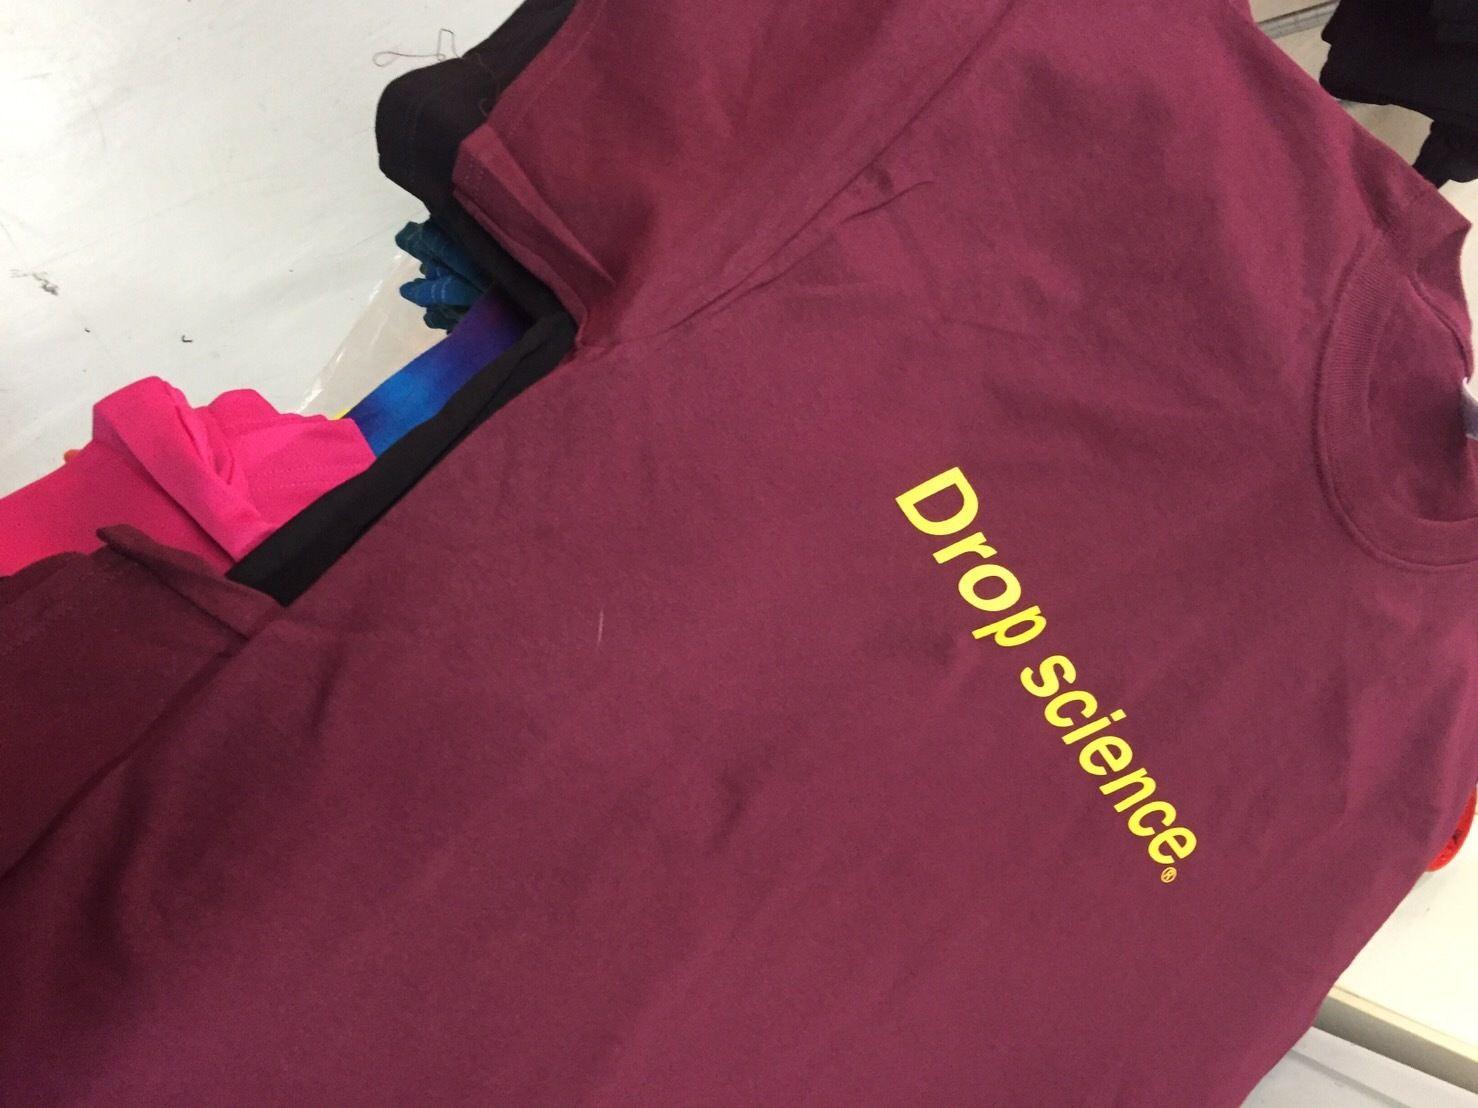 Drop science Logo Tshirt キャバリアーズカラー